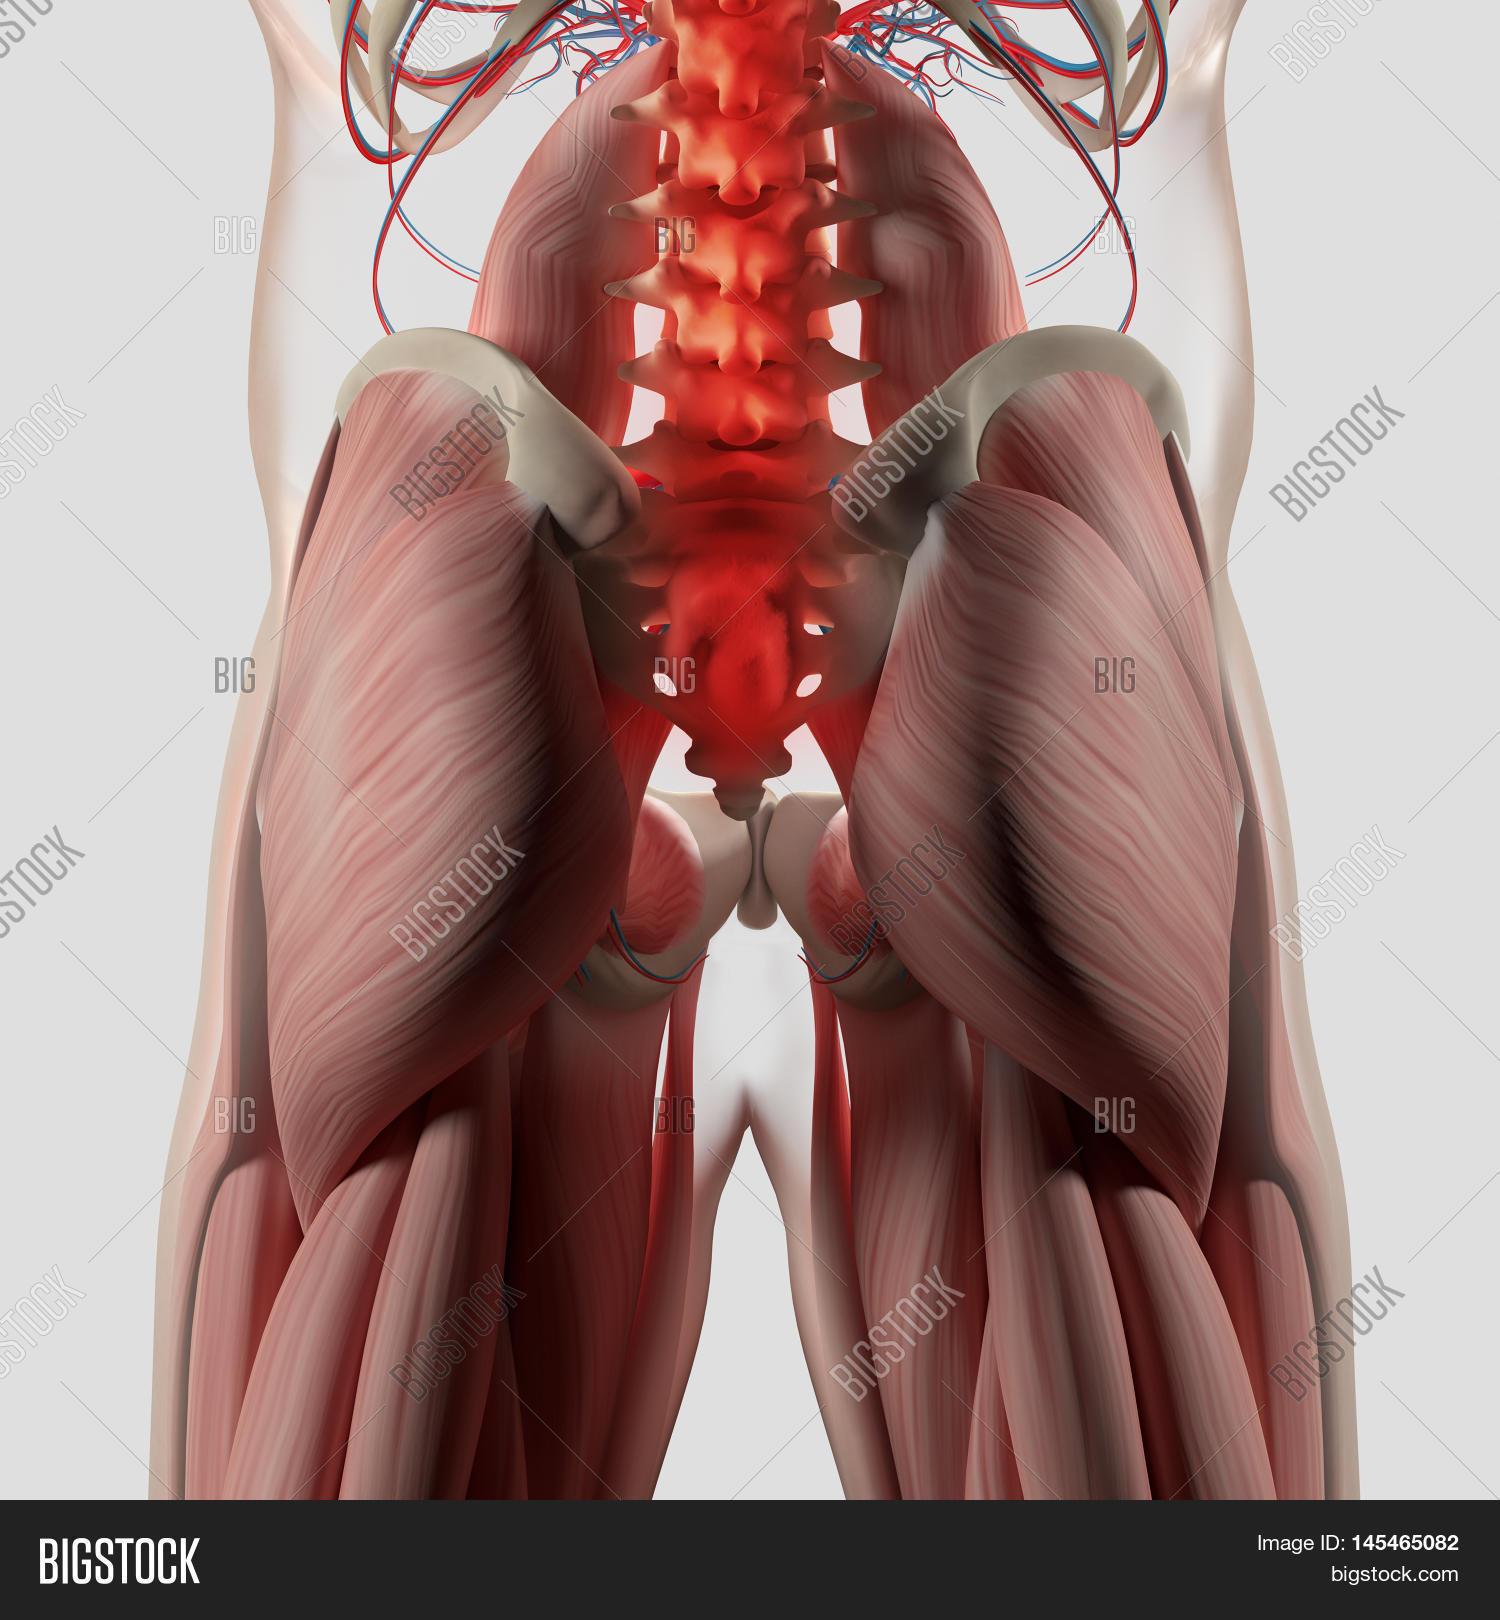 Human Anatomy, Spine, Image & Photo (Free Trial) | Bigstock